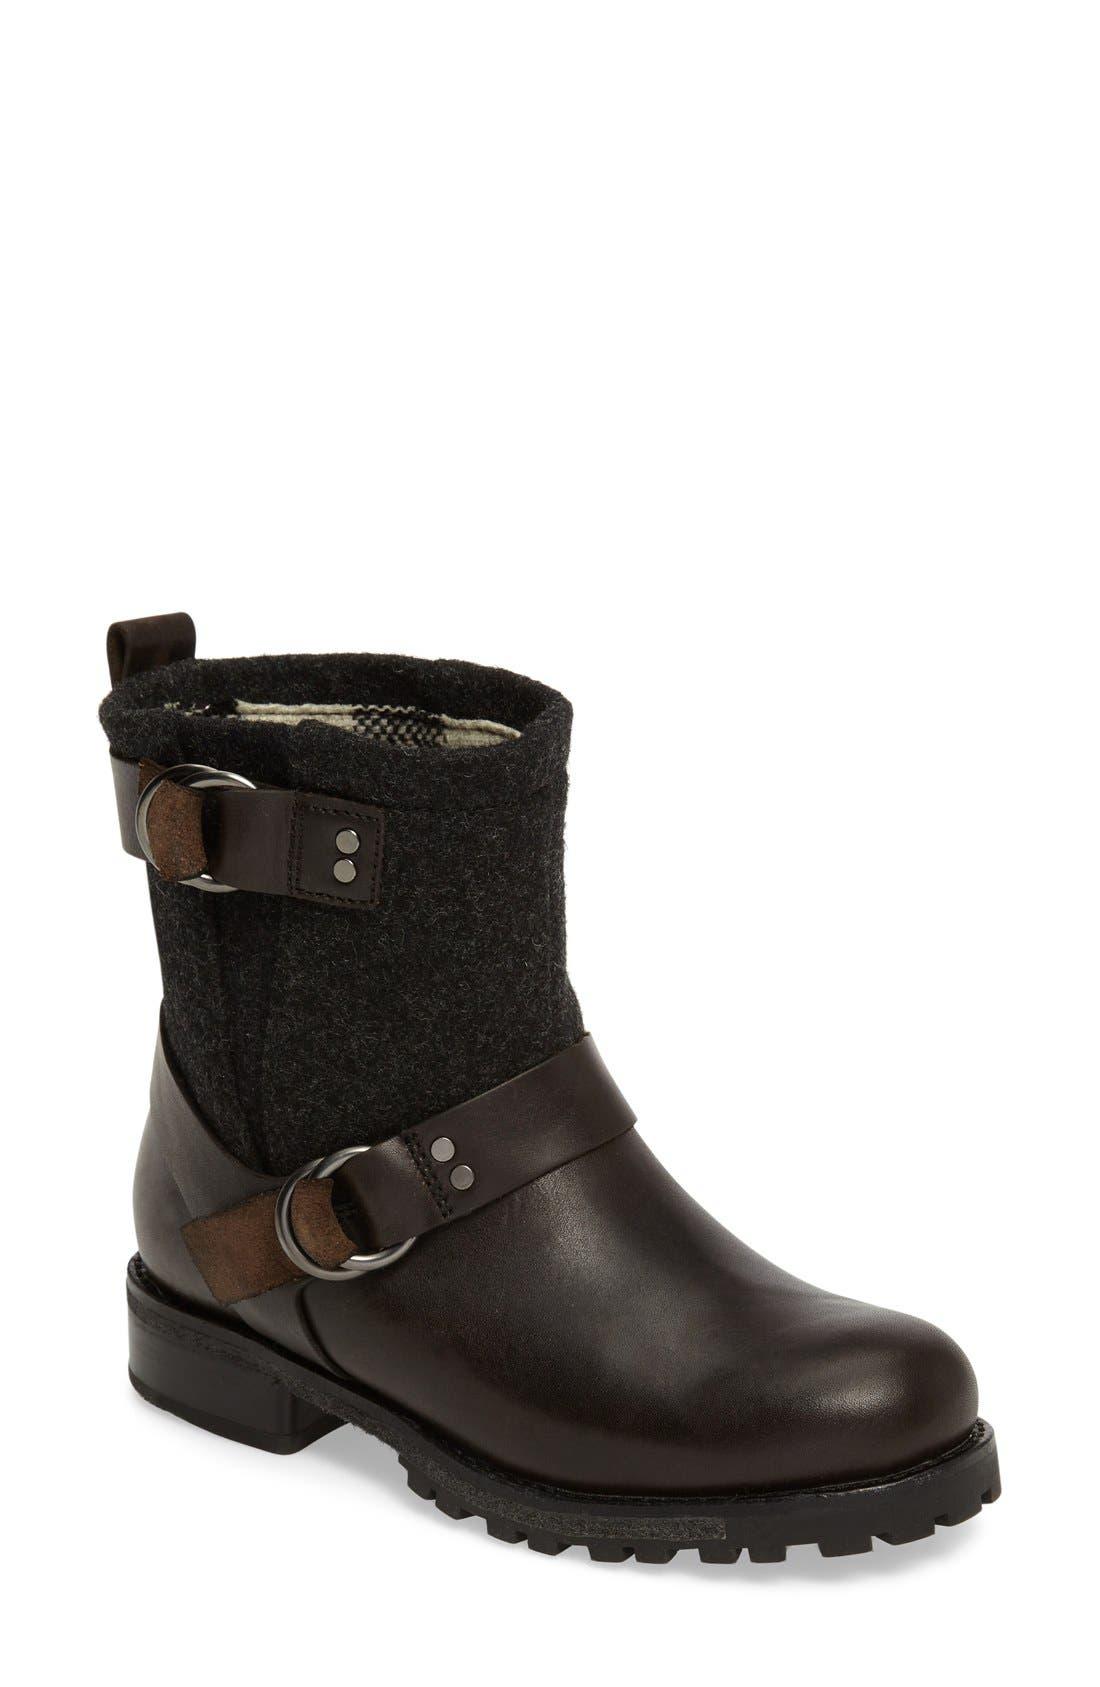 Alternate Image 1 Selected - Woolrich 'Baltimore' Engineer Boot (Women)